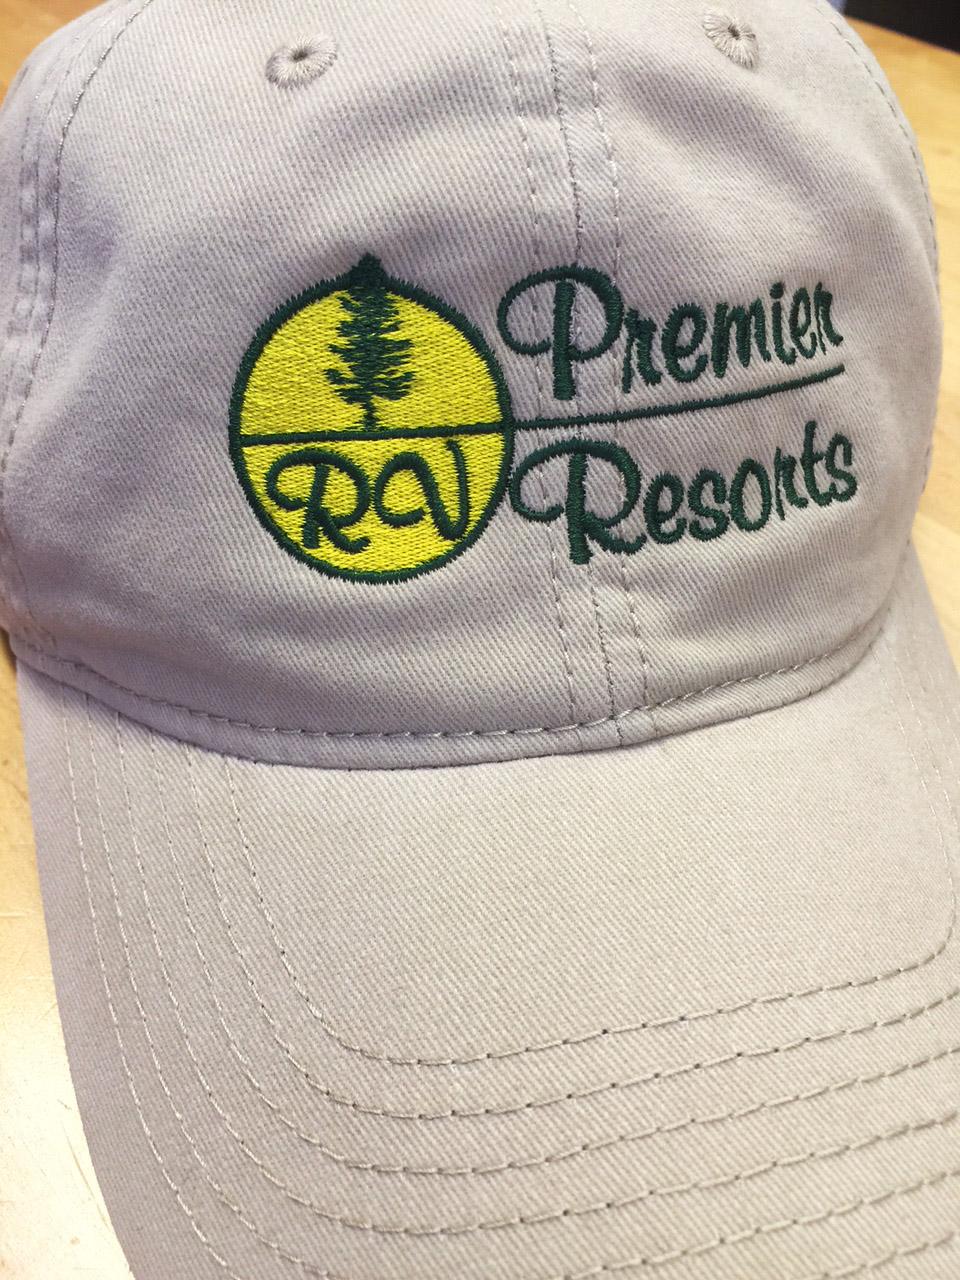 Premier RV Embroidery